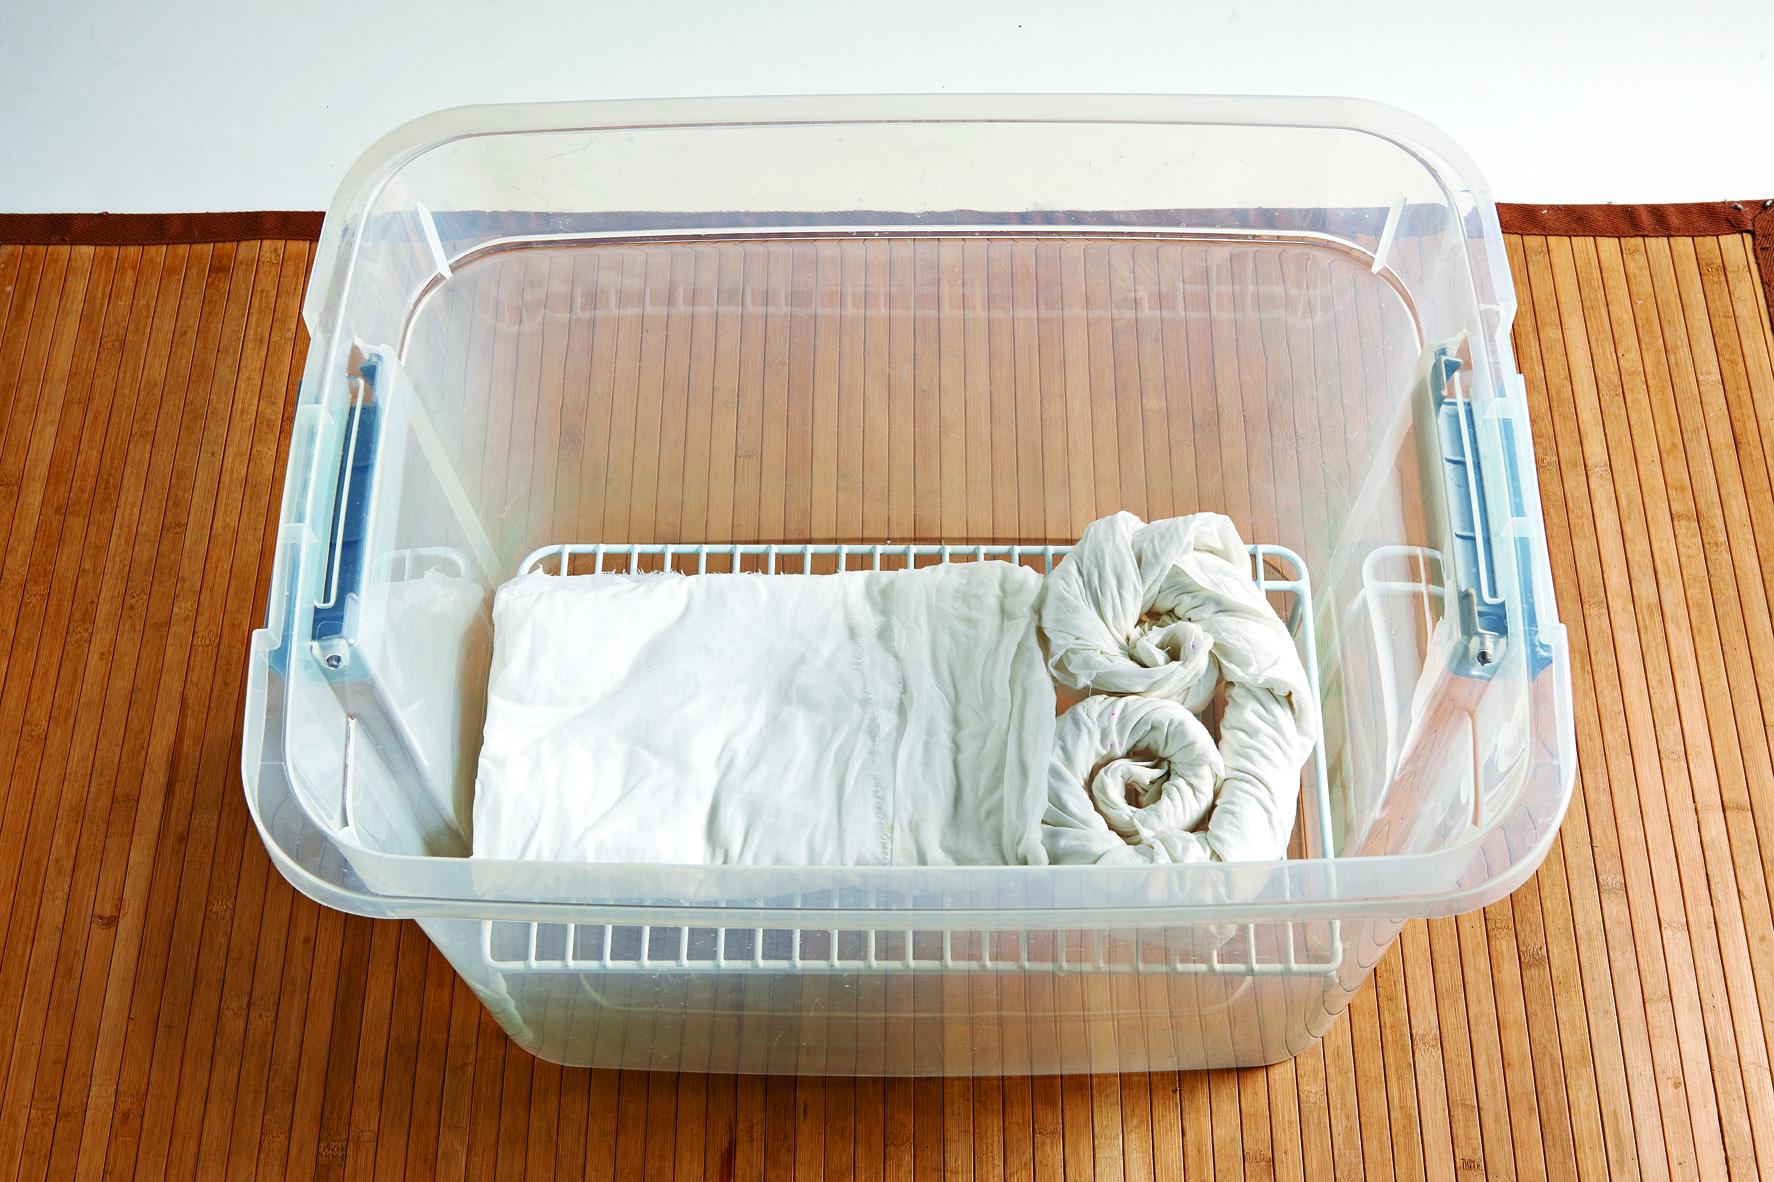 Plastic Storage bin with fabric and kitchen shelf.